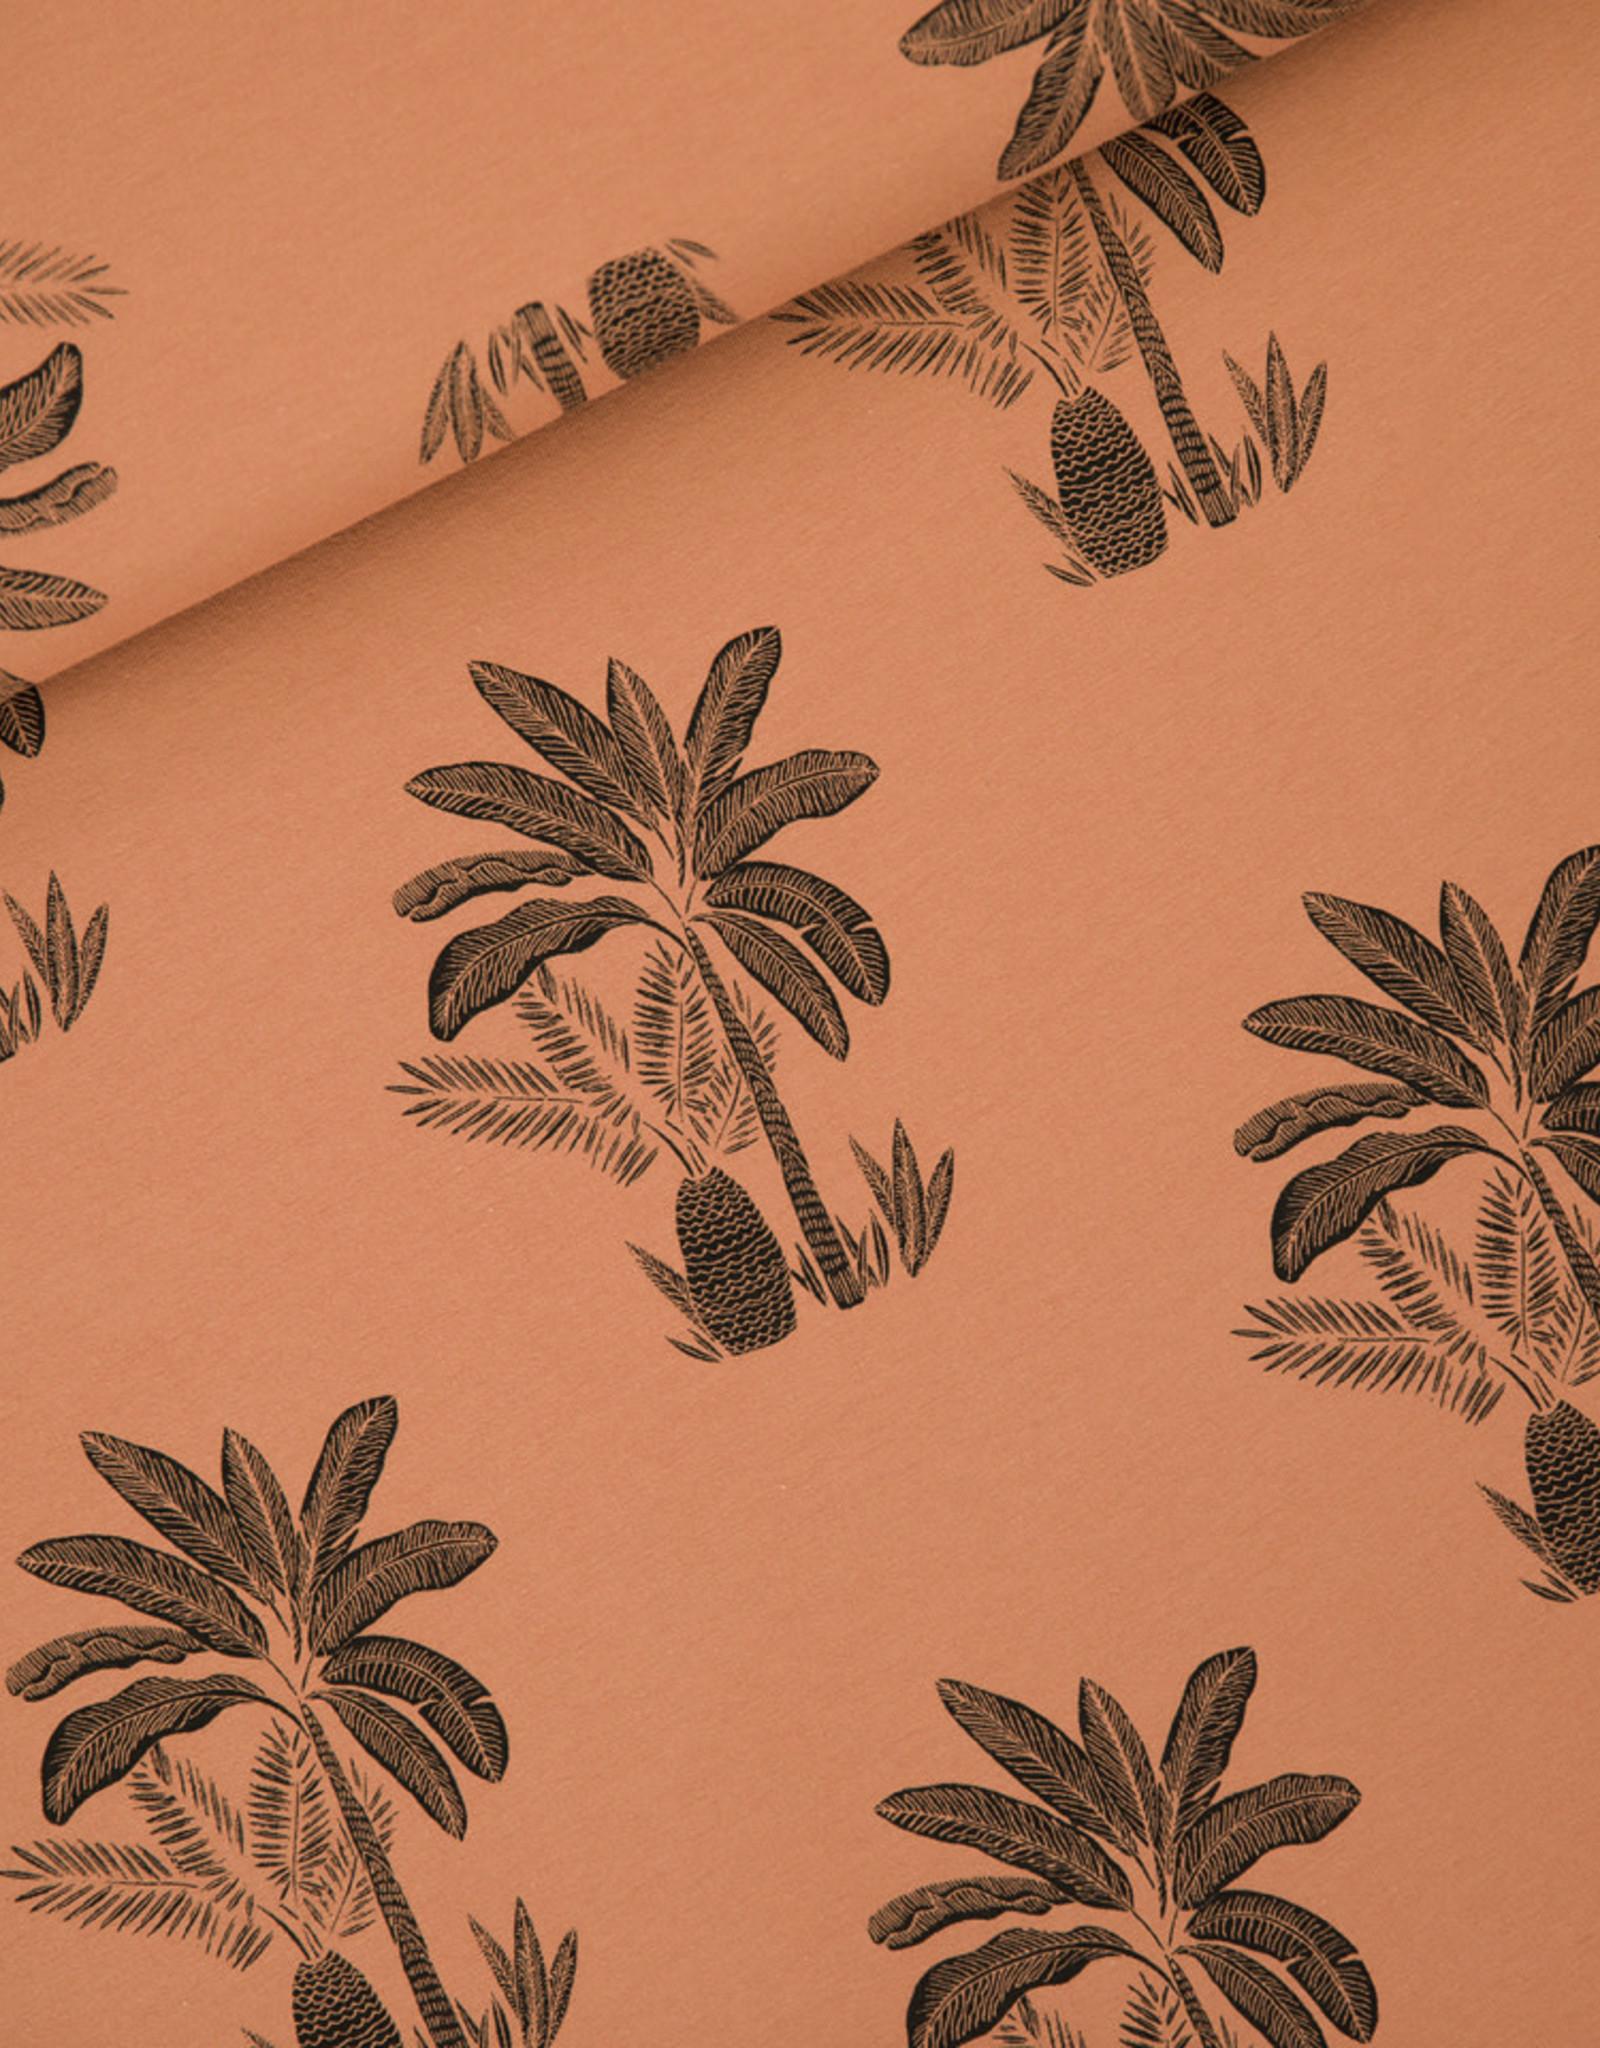 Stik-Stof Jurk korte mouw palm trees